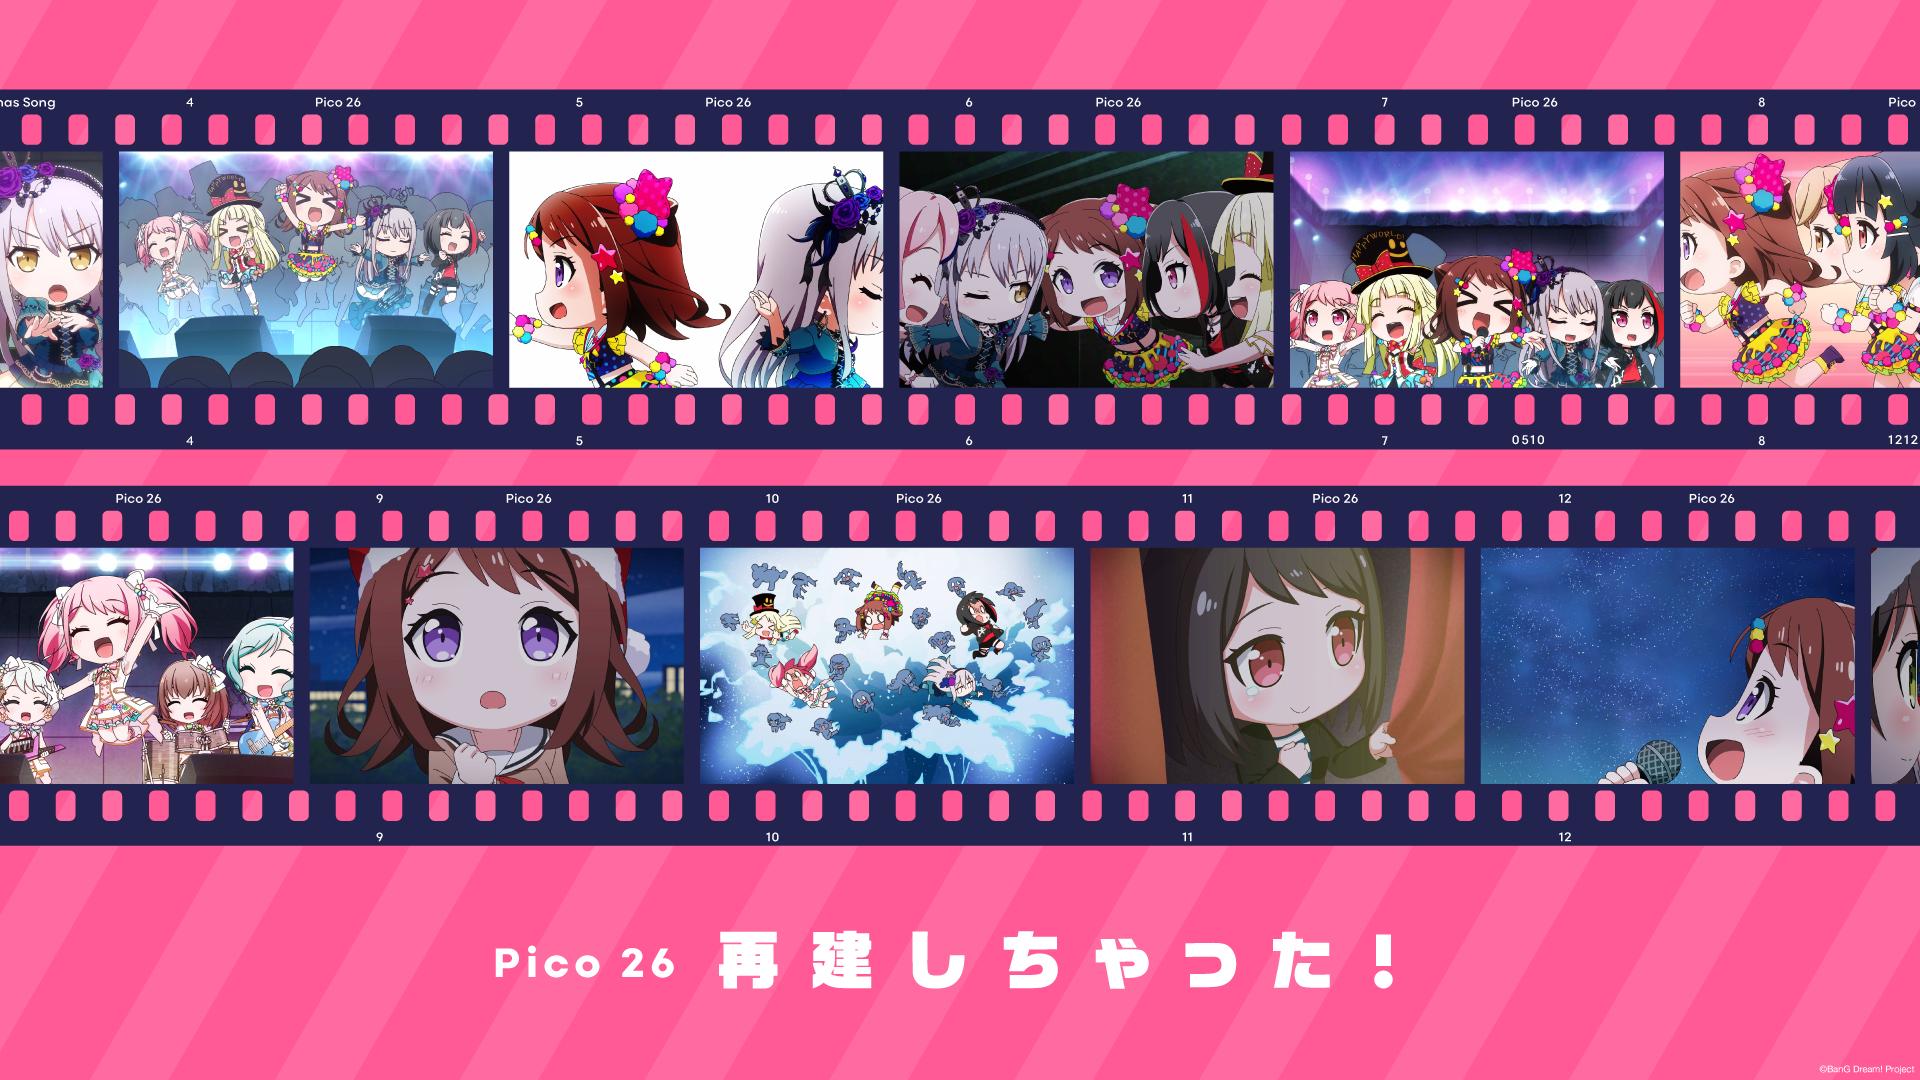 Pico26壁紙プレゼント Bang Dream ガルパ ピコ 大盛り 公式サイト